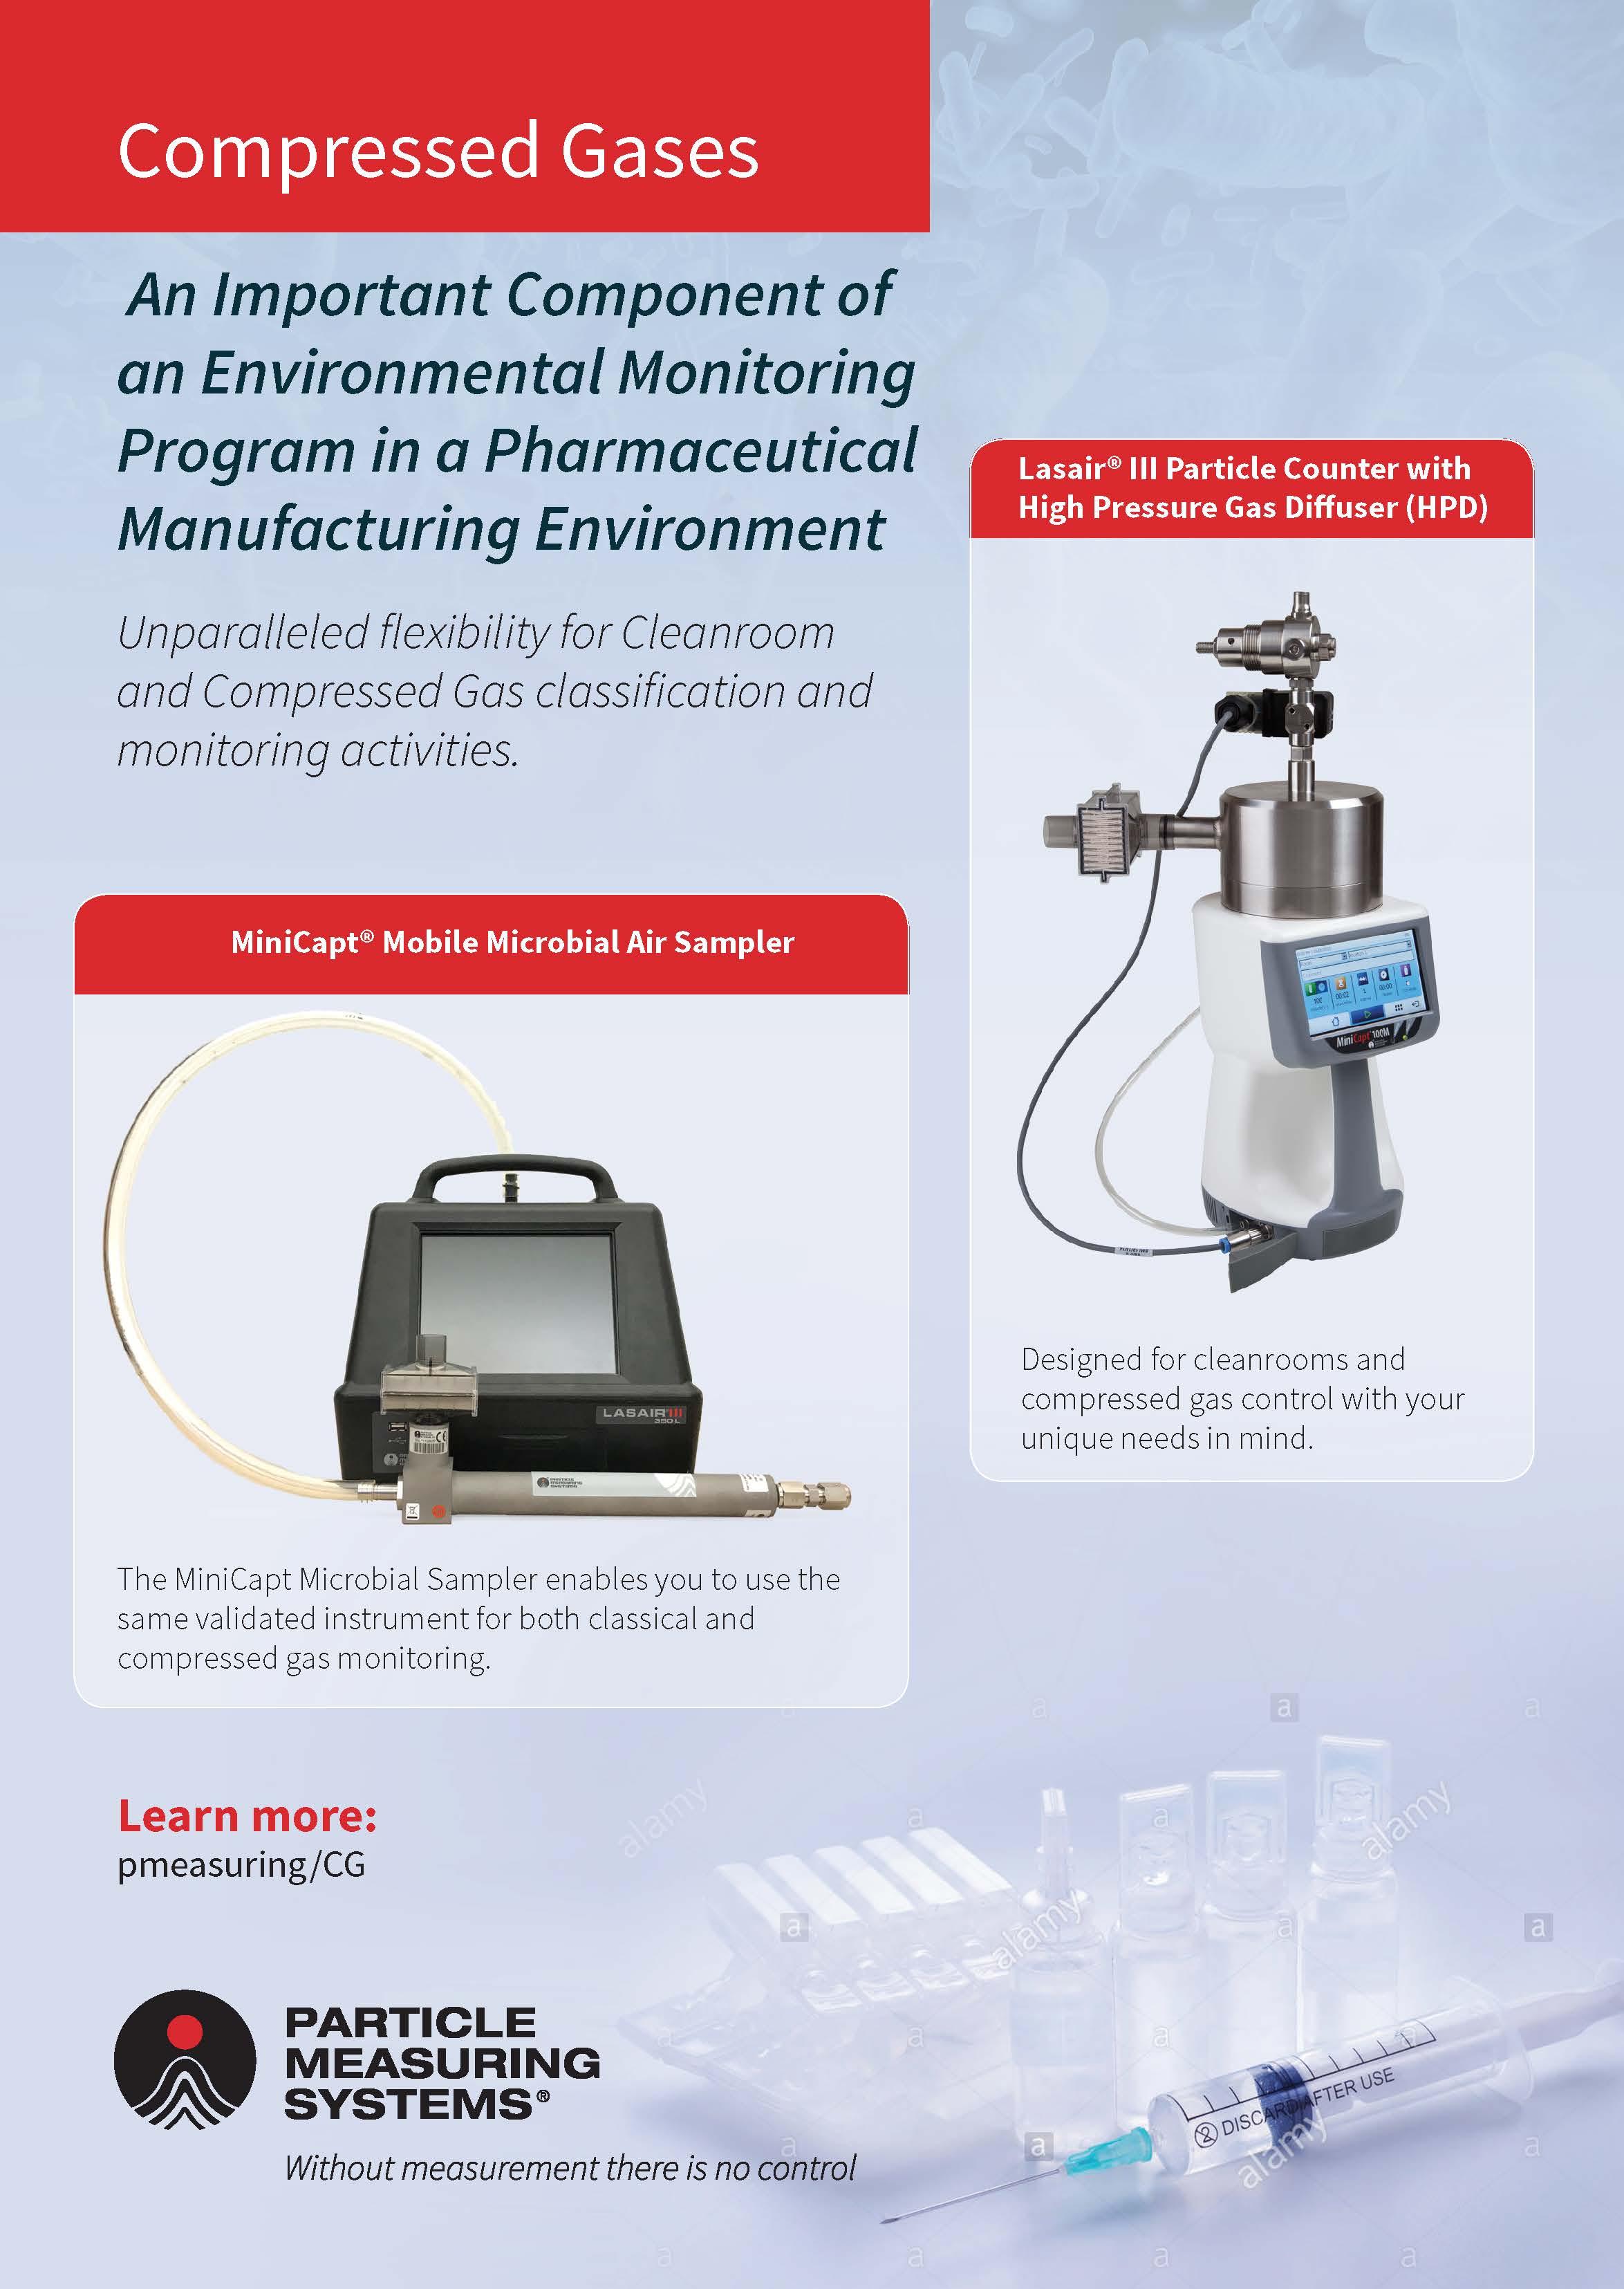 EPR Compressed Gas ad